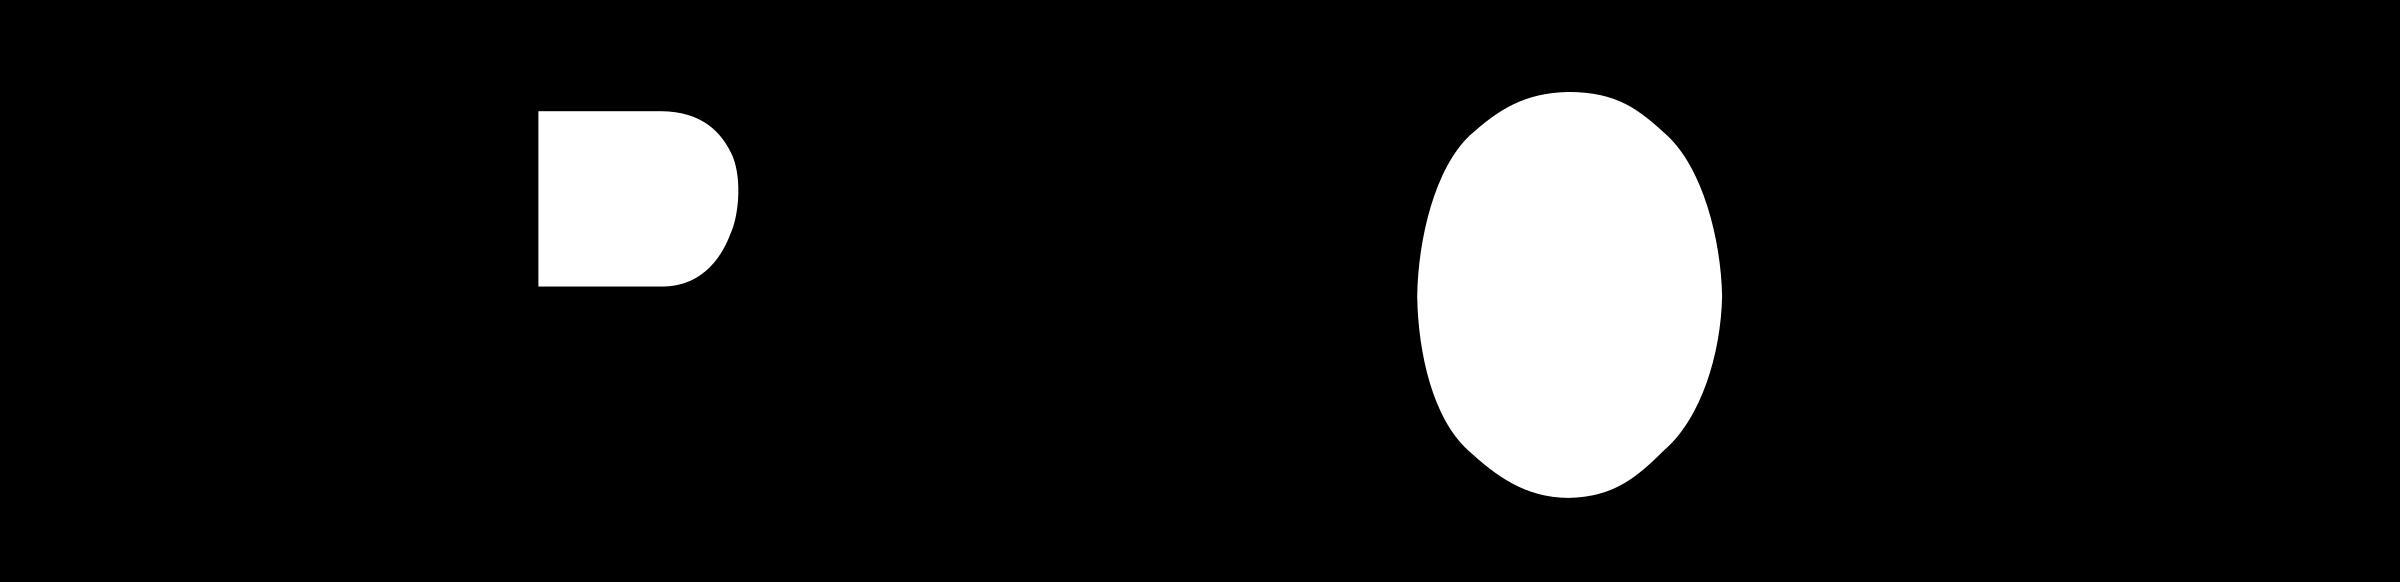 *epson-1-logo-png-transparent.png